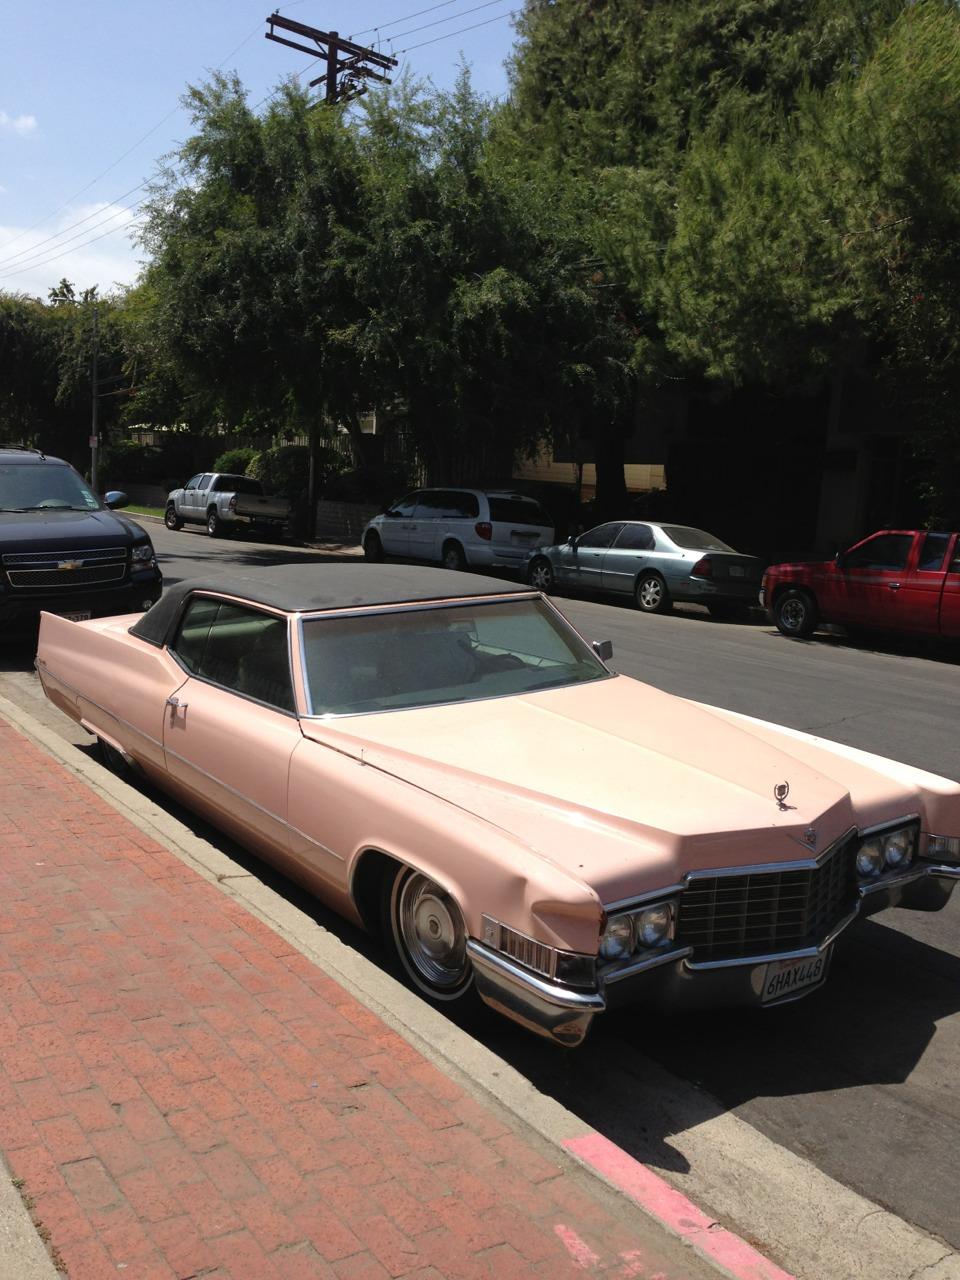 Super classic American style. Los Angeles, CA.